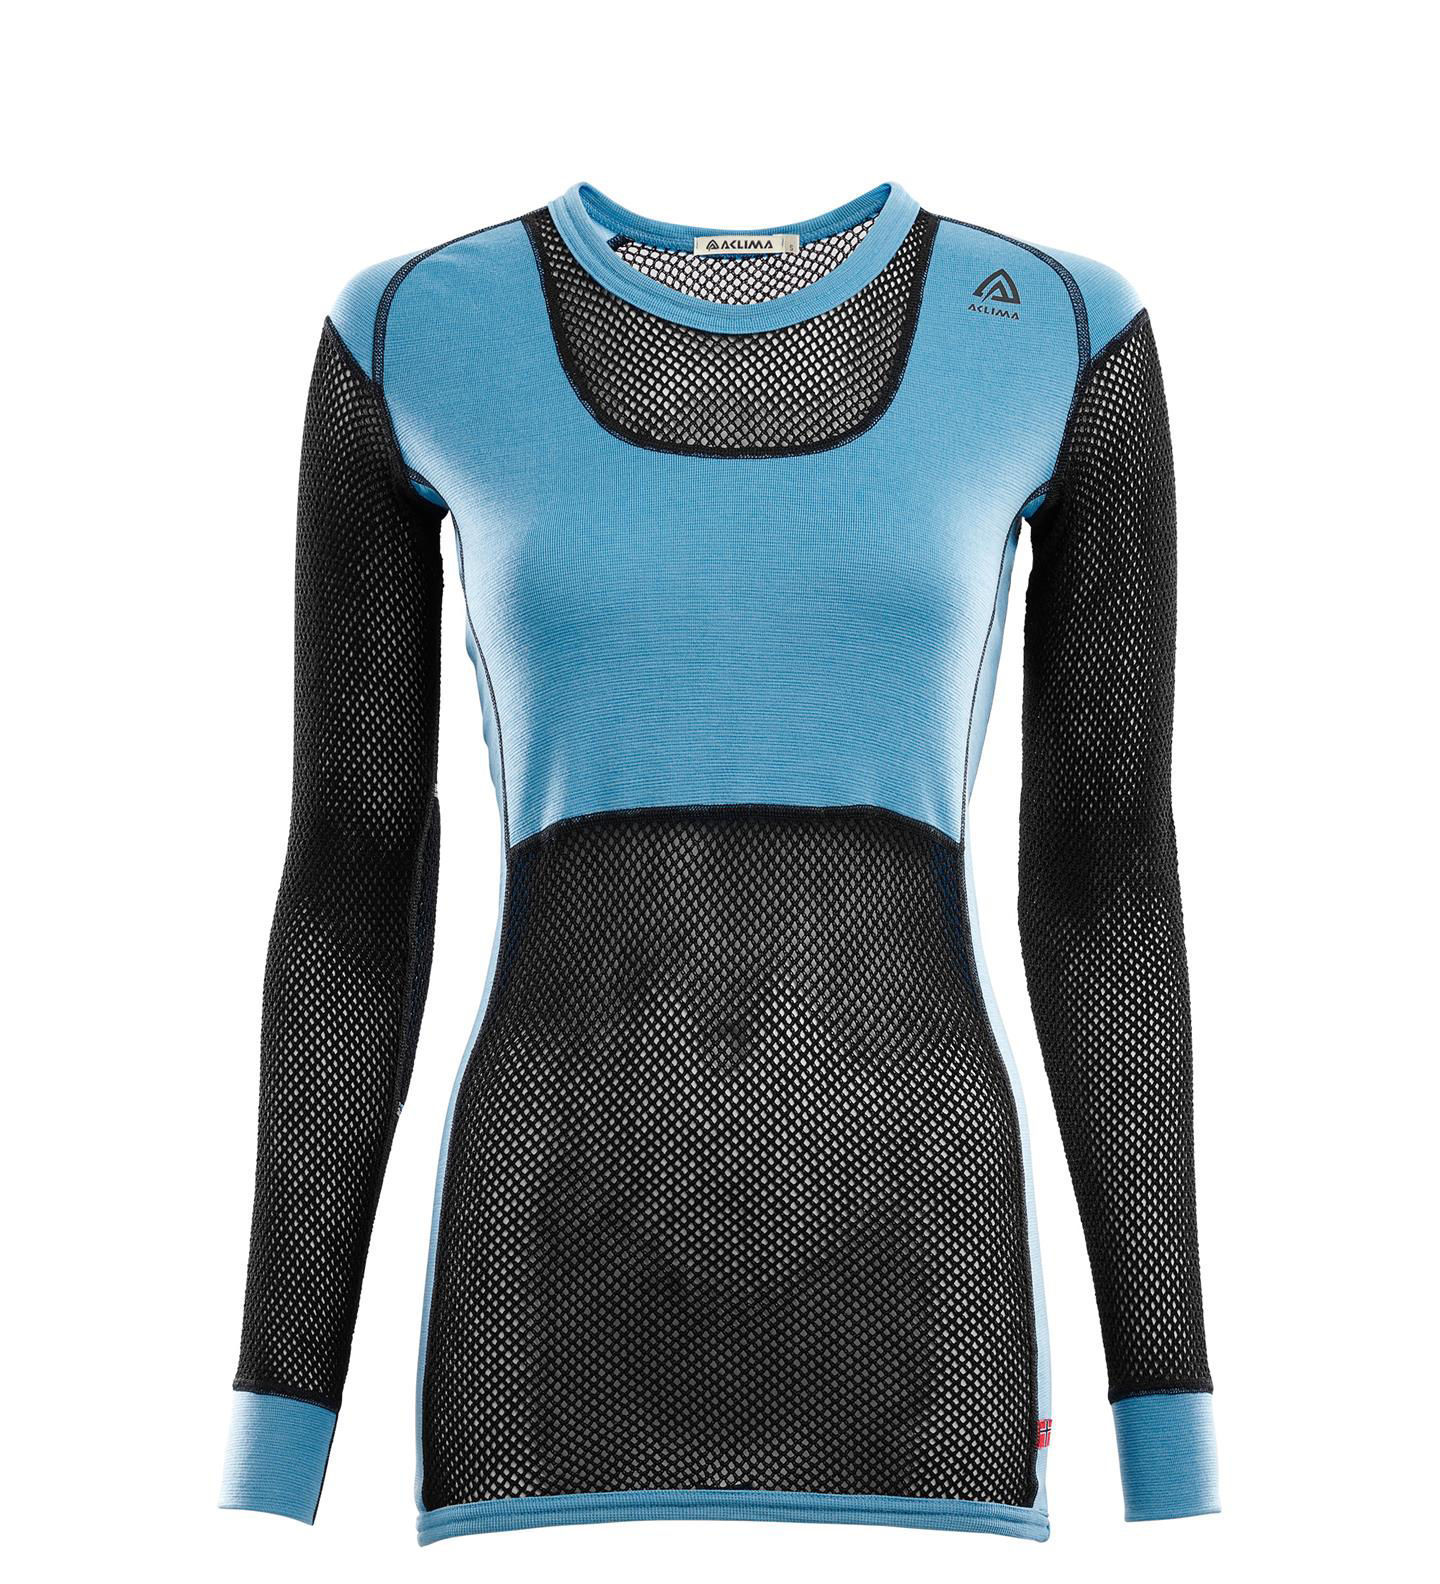 Bilde av WoolNet Crew Neck shirt, Woman